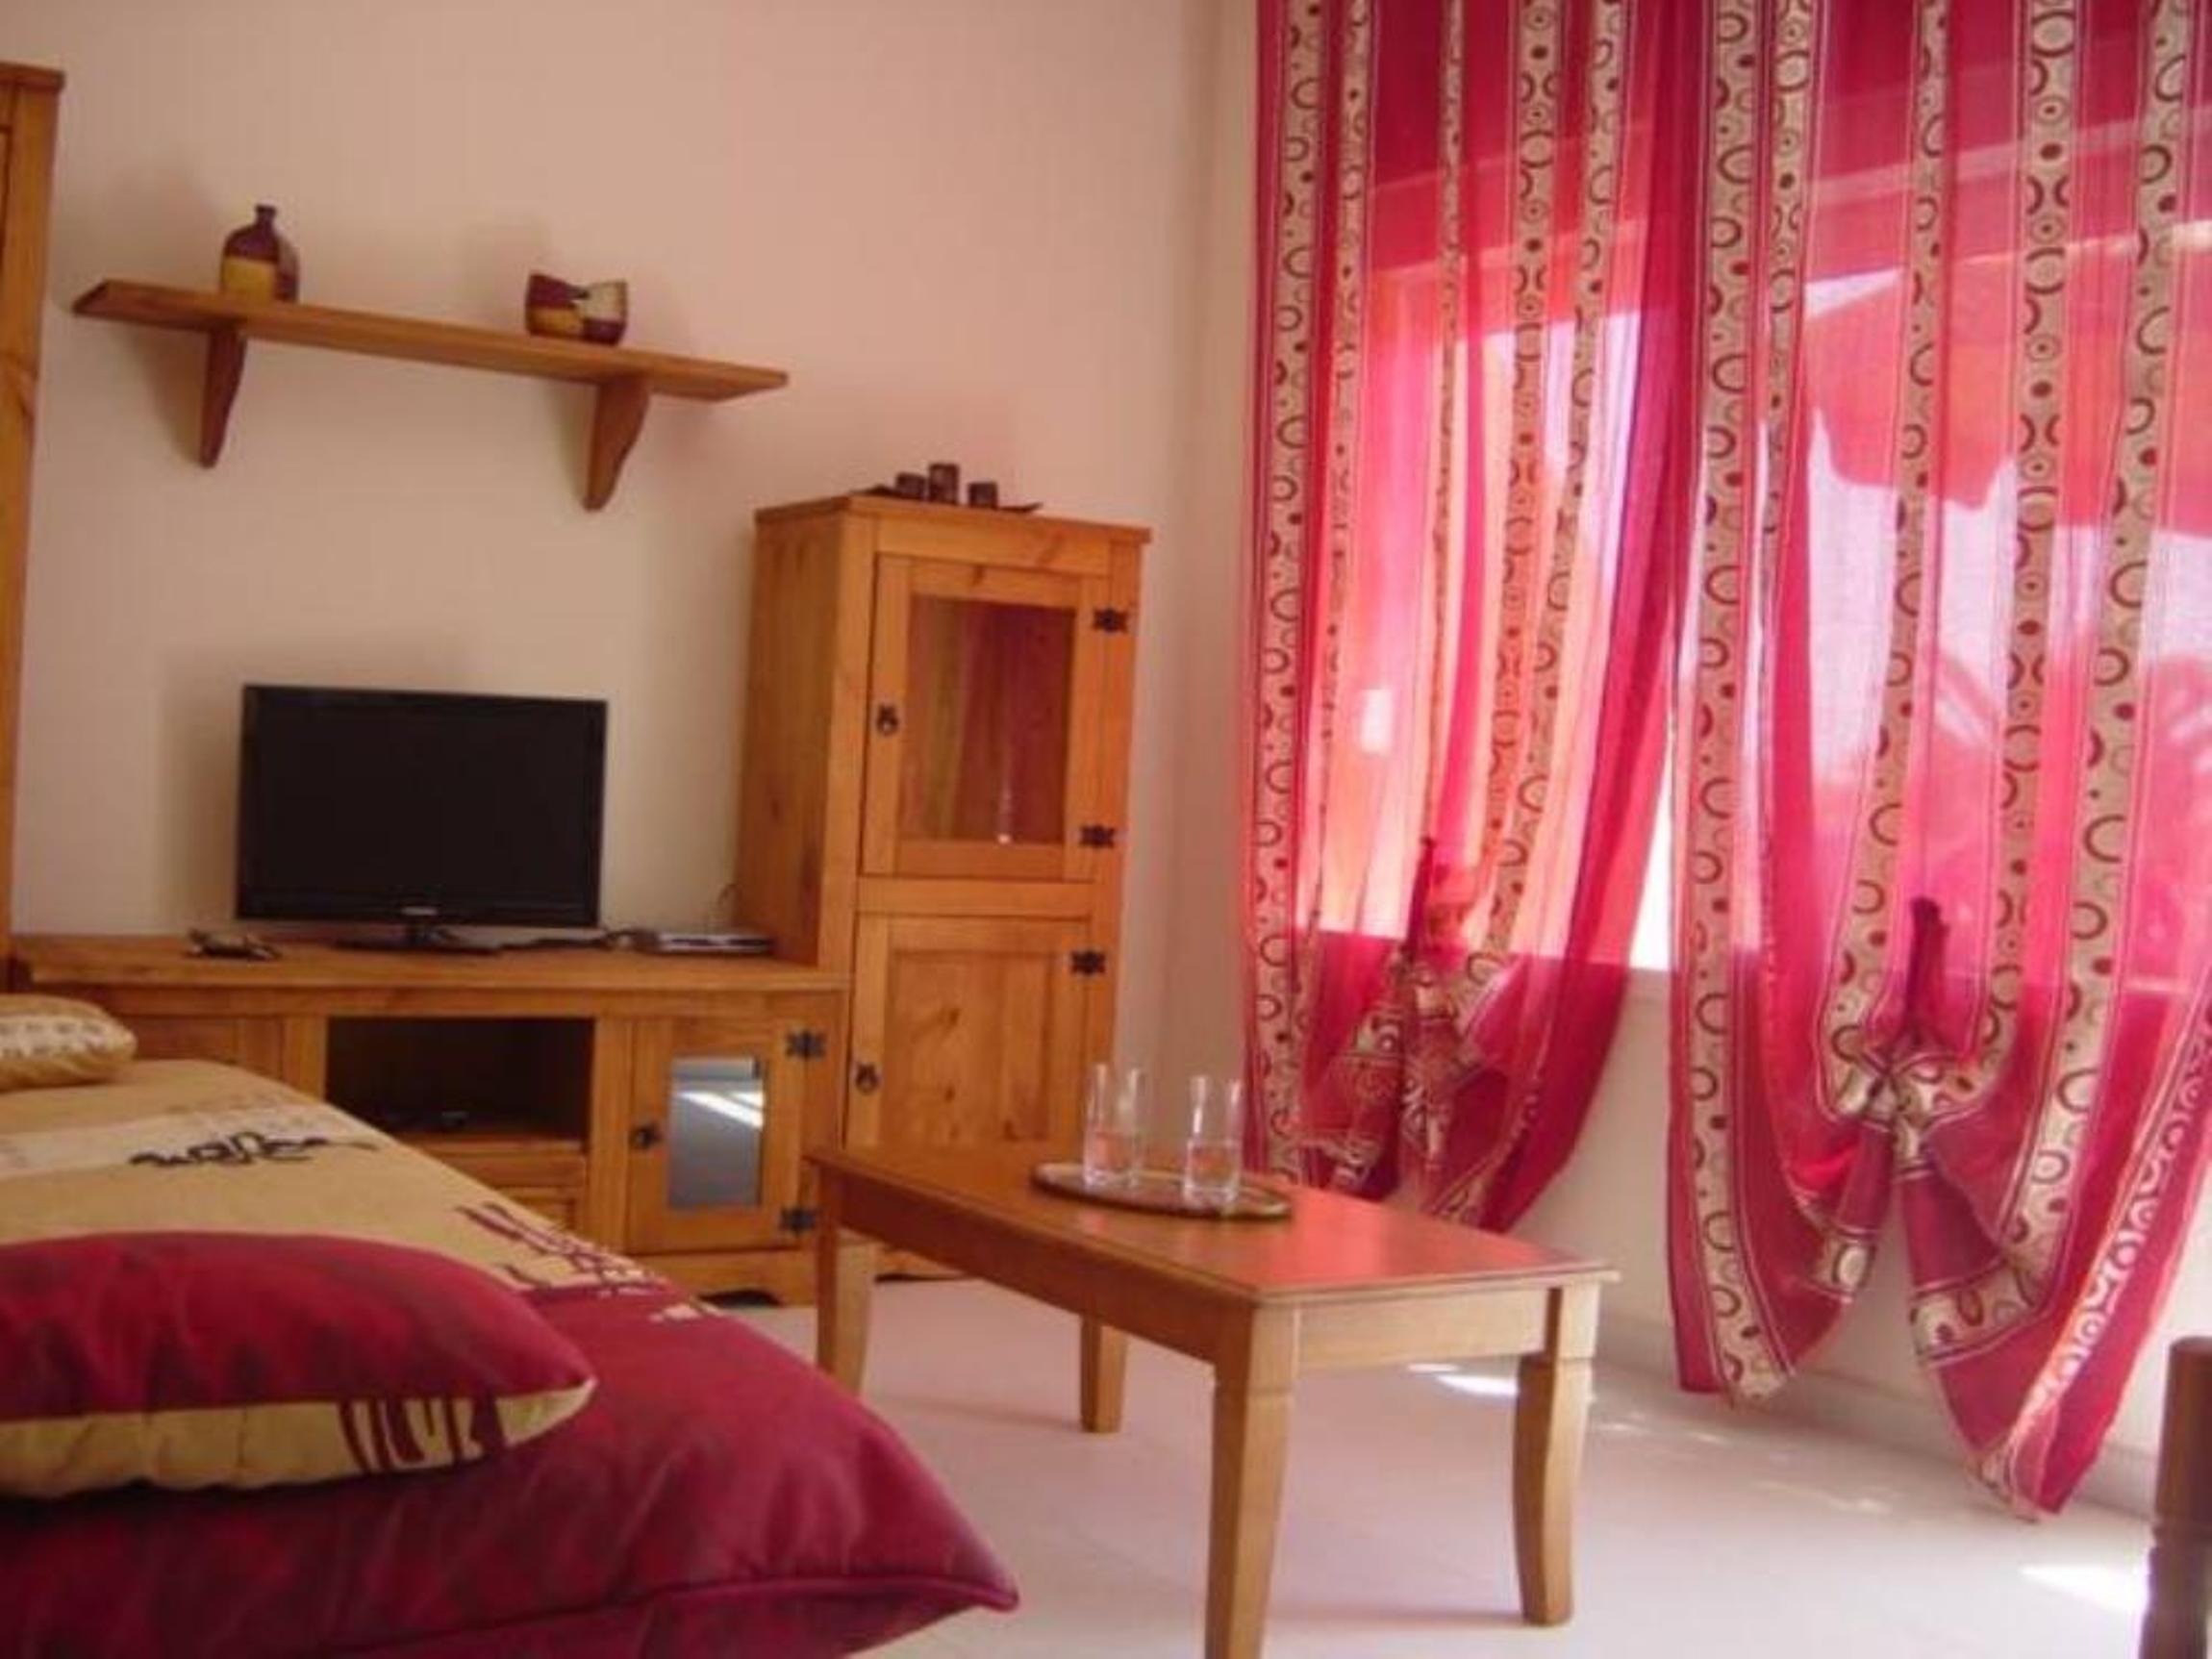 Ferienwohnung Wohnung El Mirador -Residencial Las Dunas - (2196686), Corralejo, Fuerteventura, Kanarische Inseln, Spanien, Bild 1